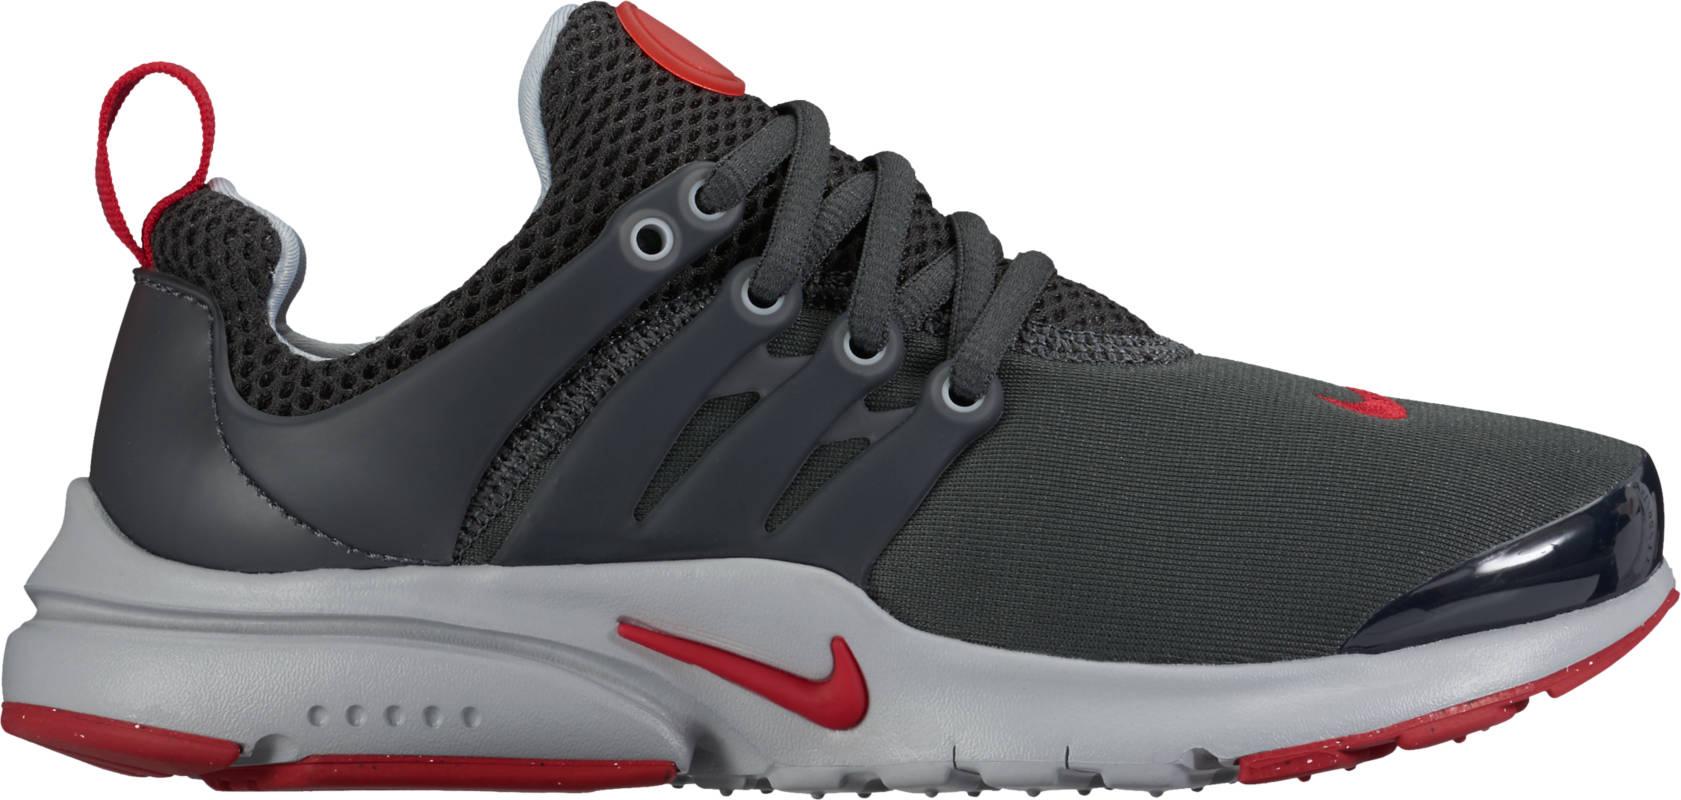 Nike Air Presto Neu Cortez (GS) Laufschuhe Sneaker Neu Presto Roshe One Run Free Huarache 73b9a4